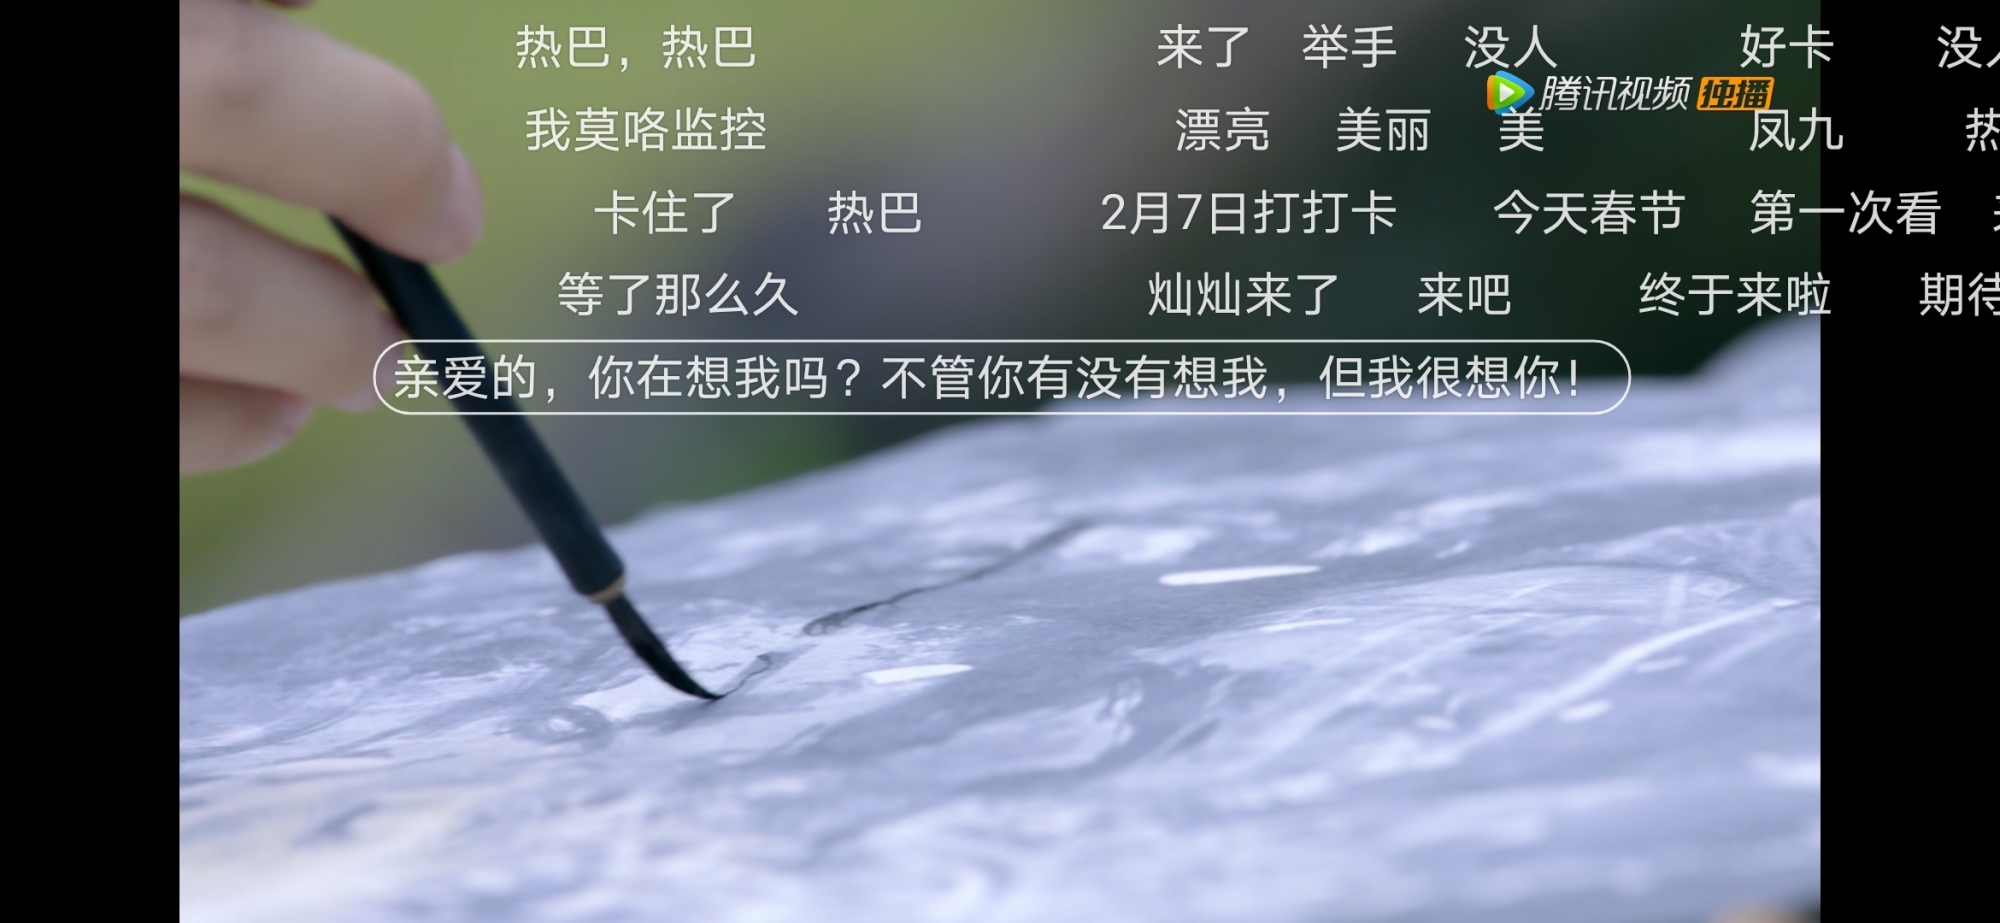 Screenshot_20200218_103722_com.tencent.qqlivehuawei.jpg